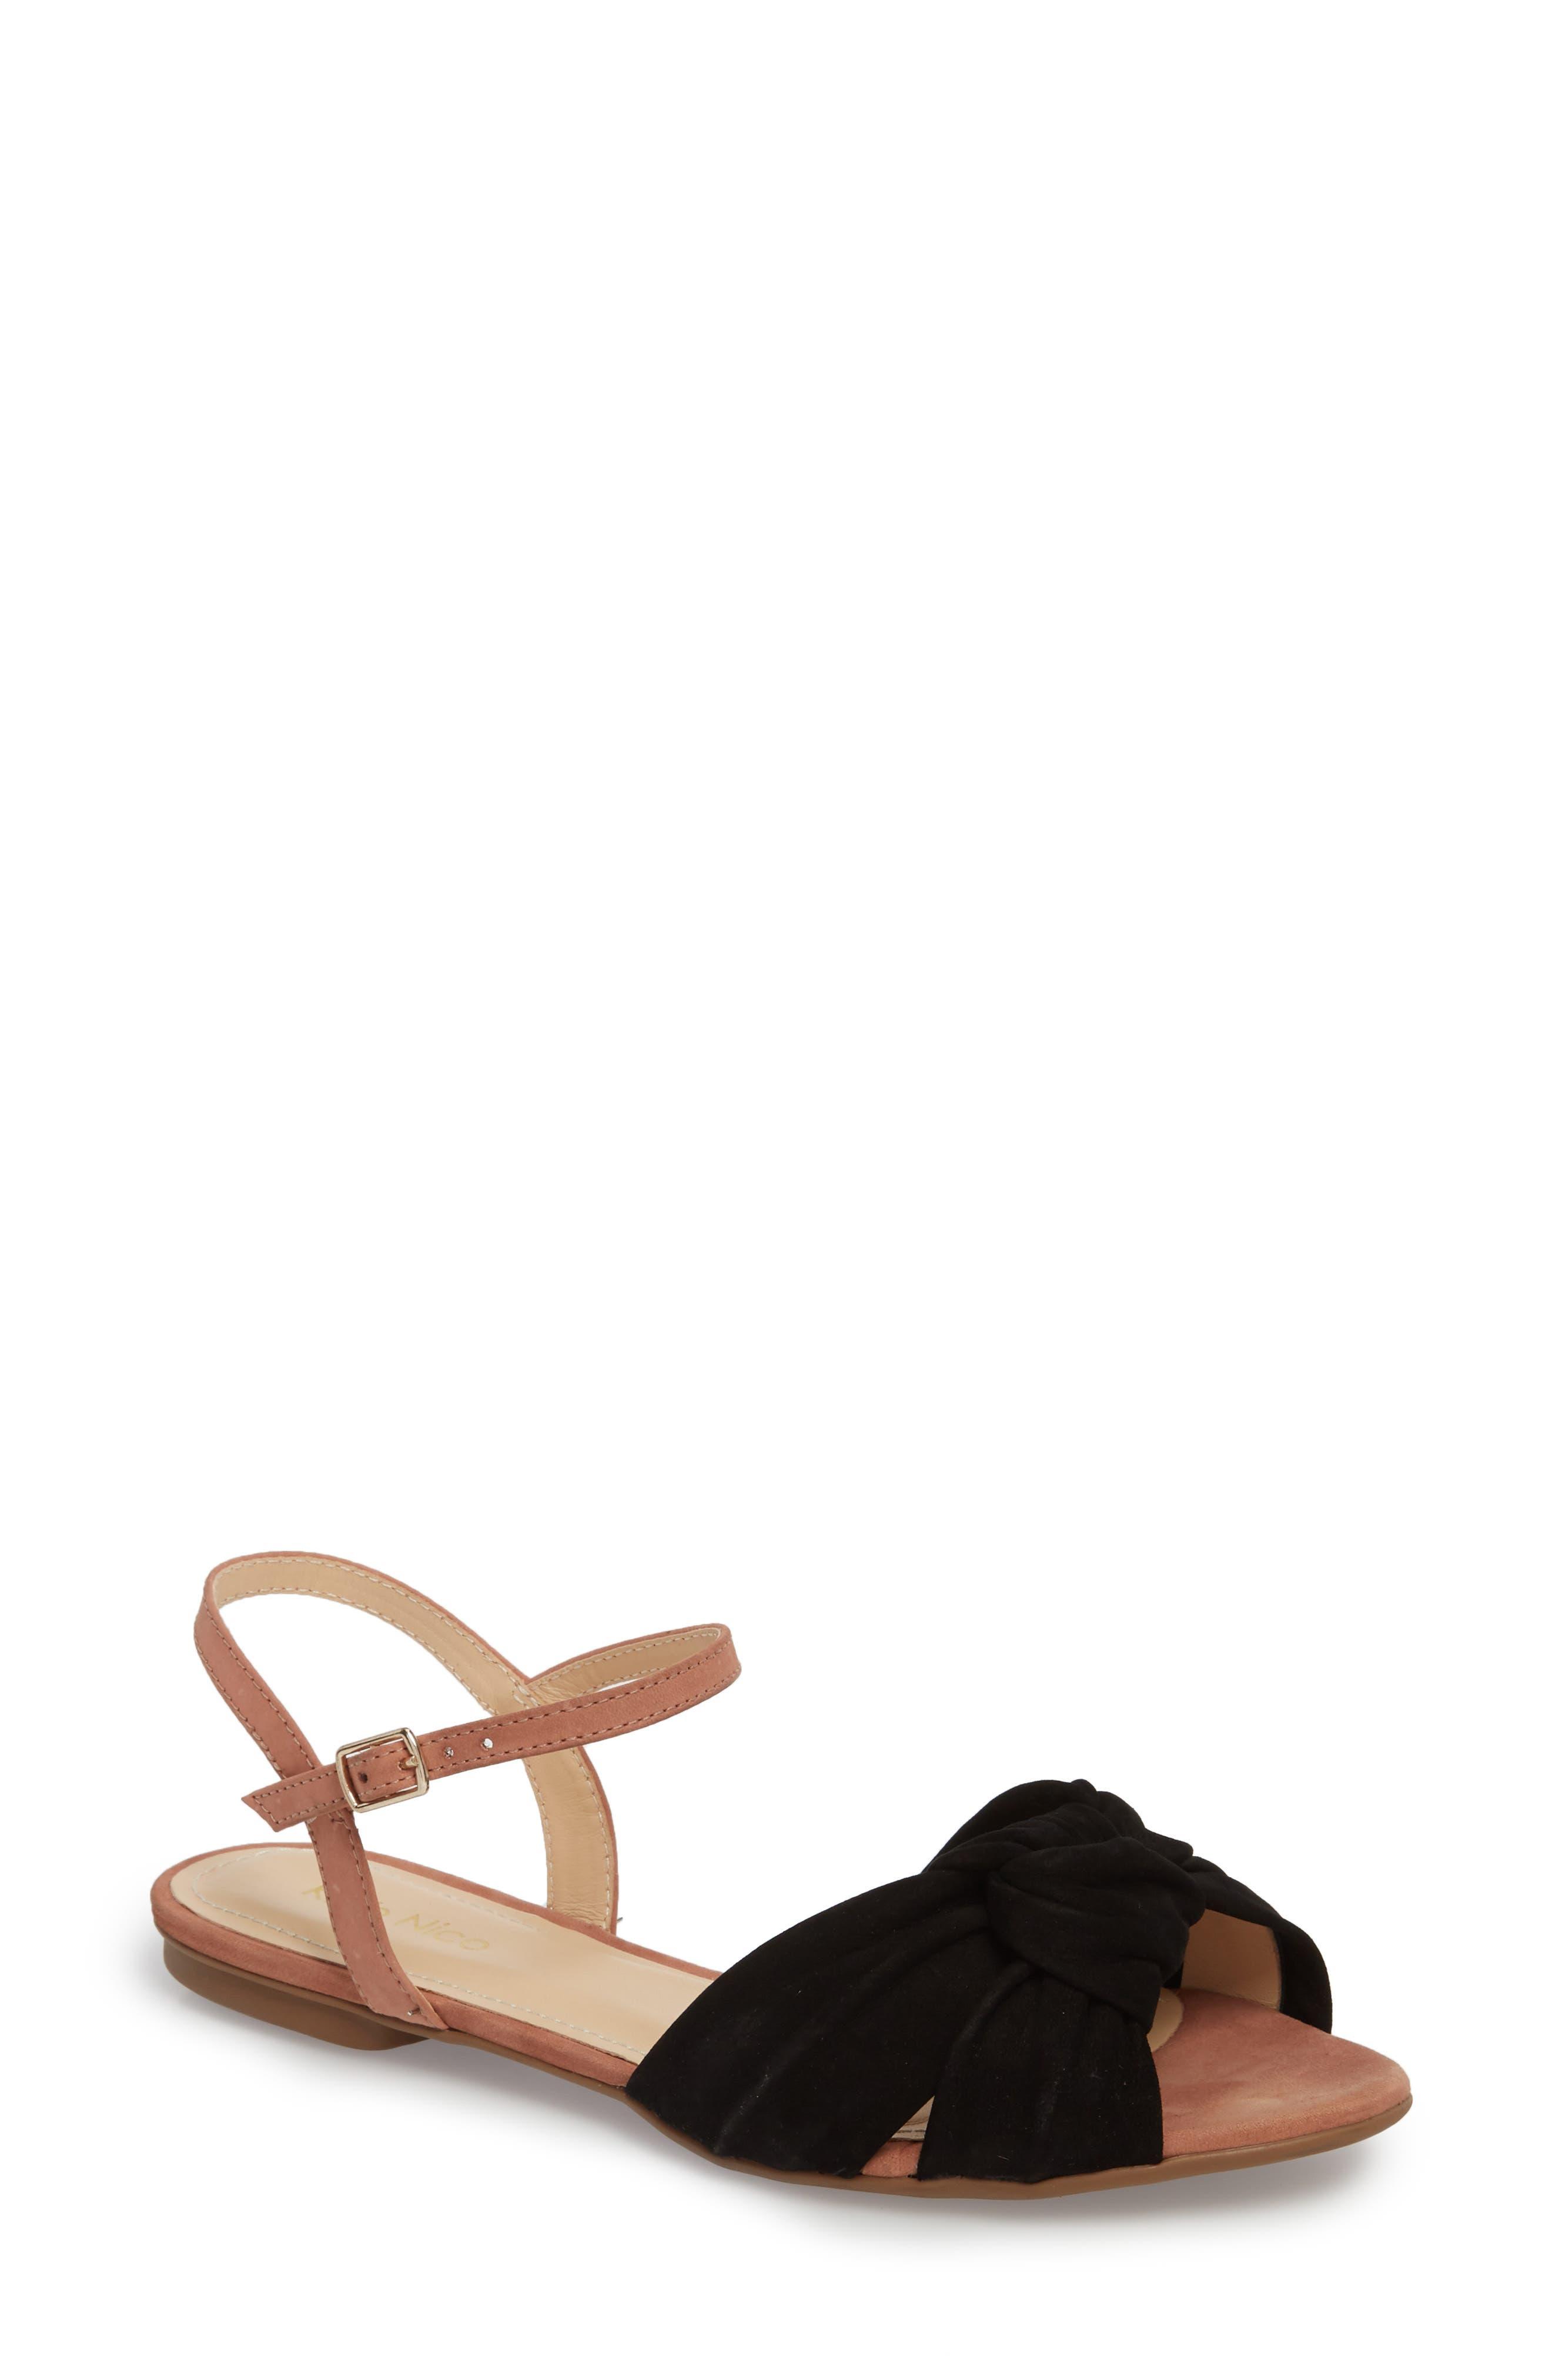 Giley Sandal,                             Main thumbnail 1, color,                             Black Nubuck Leather